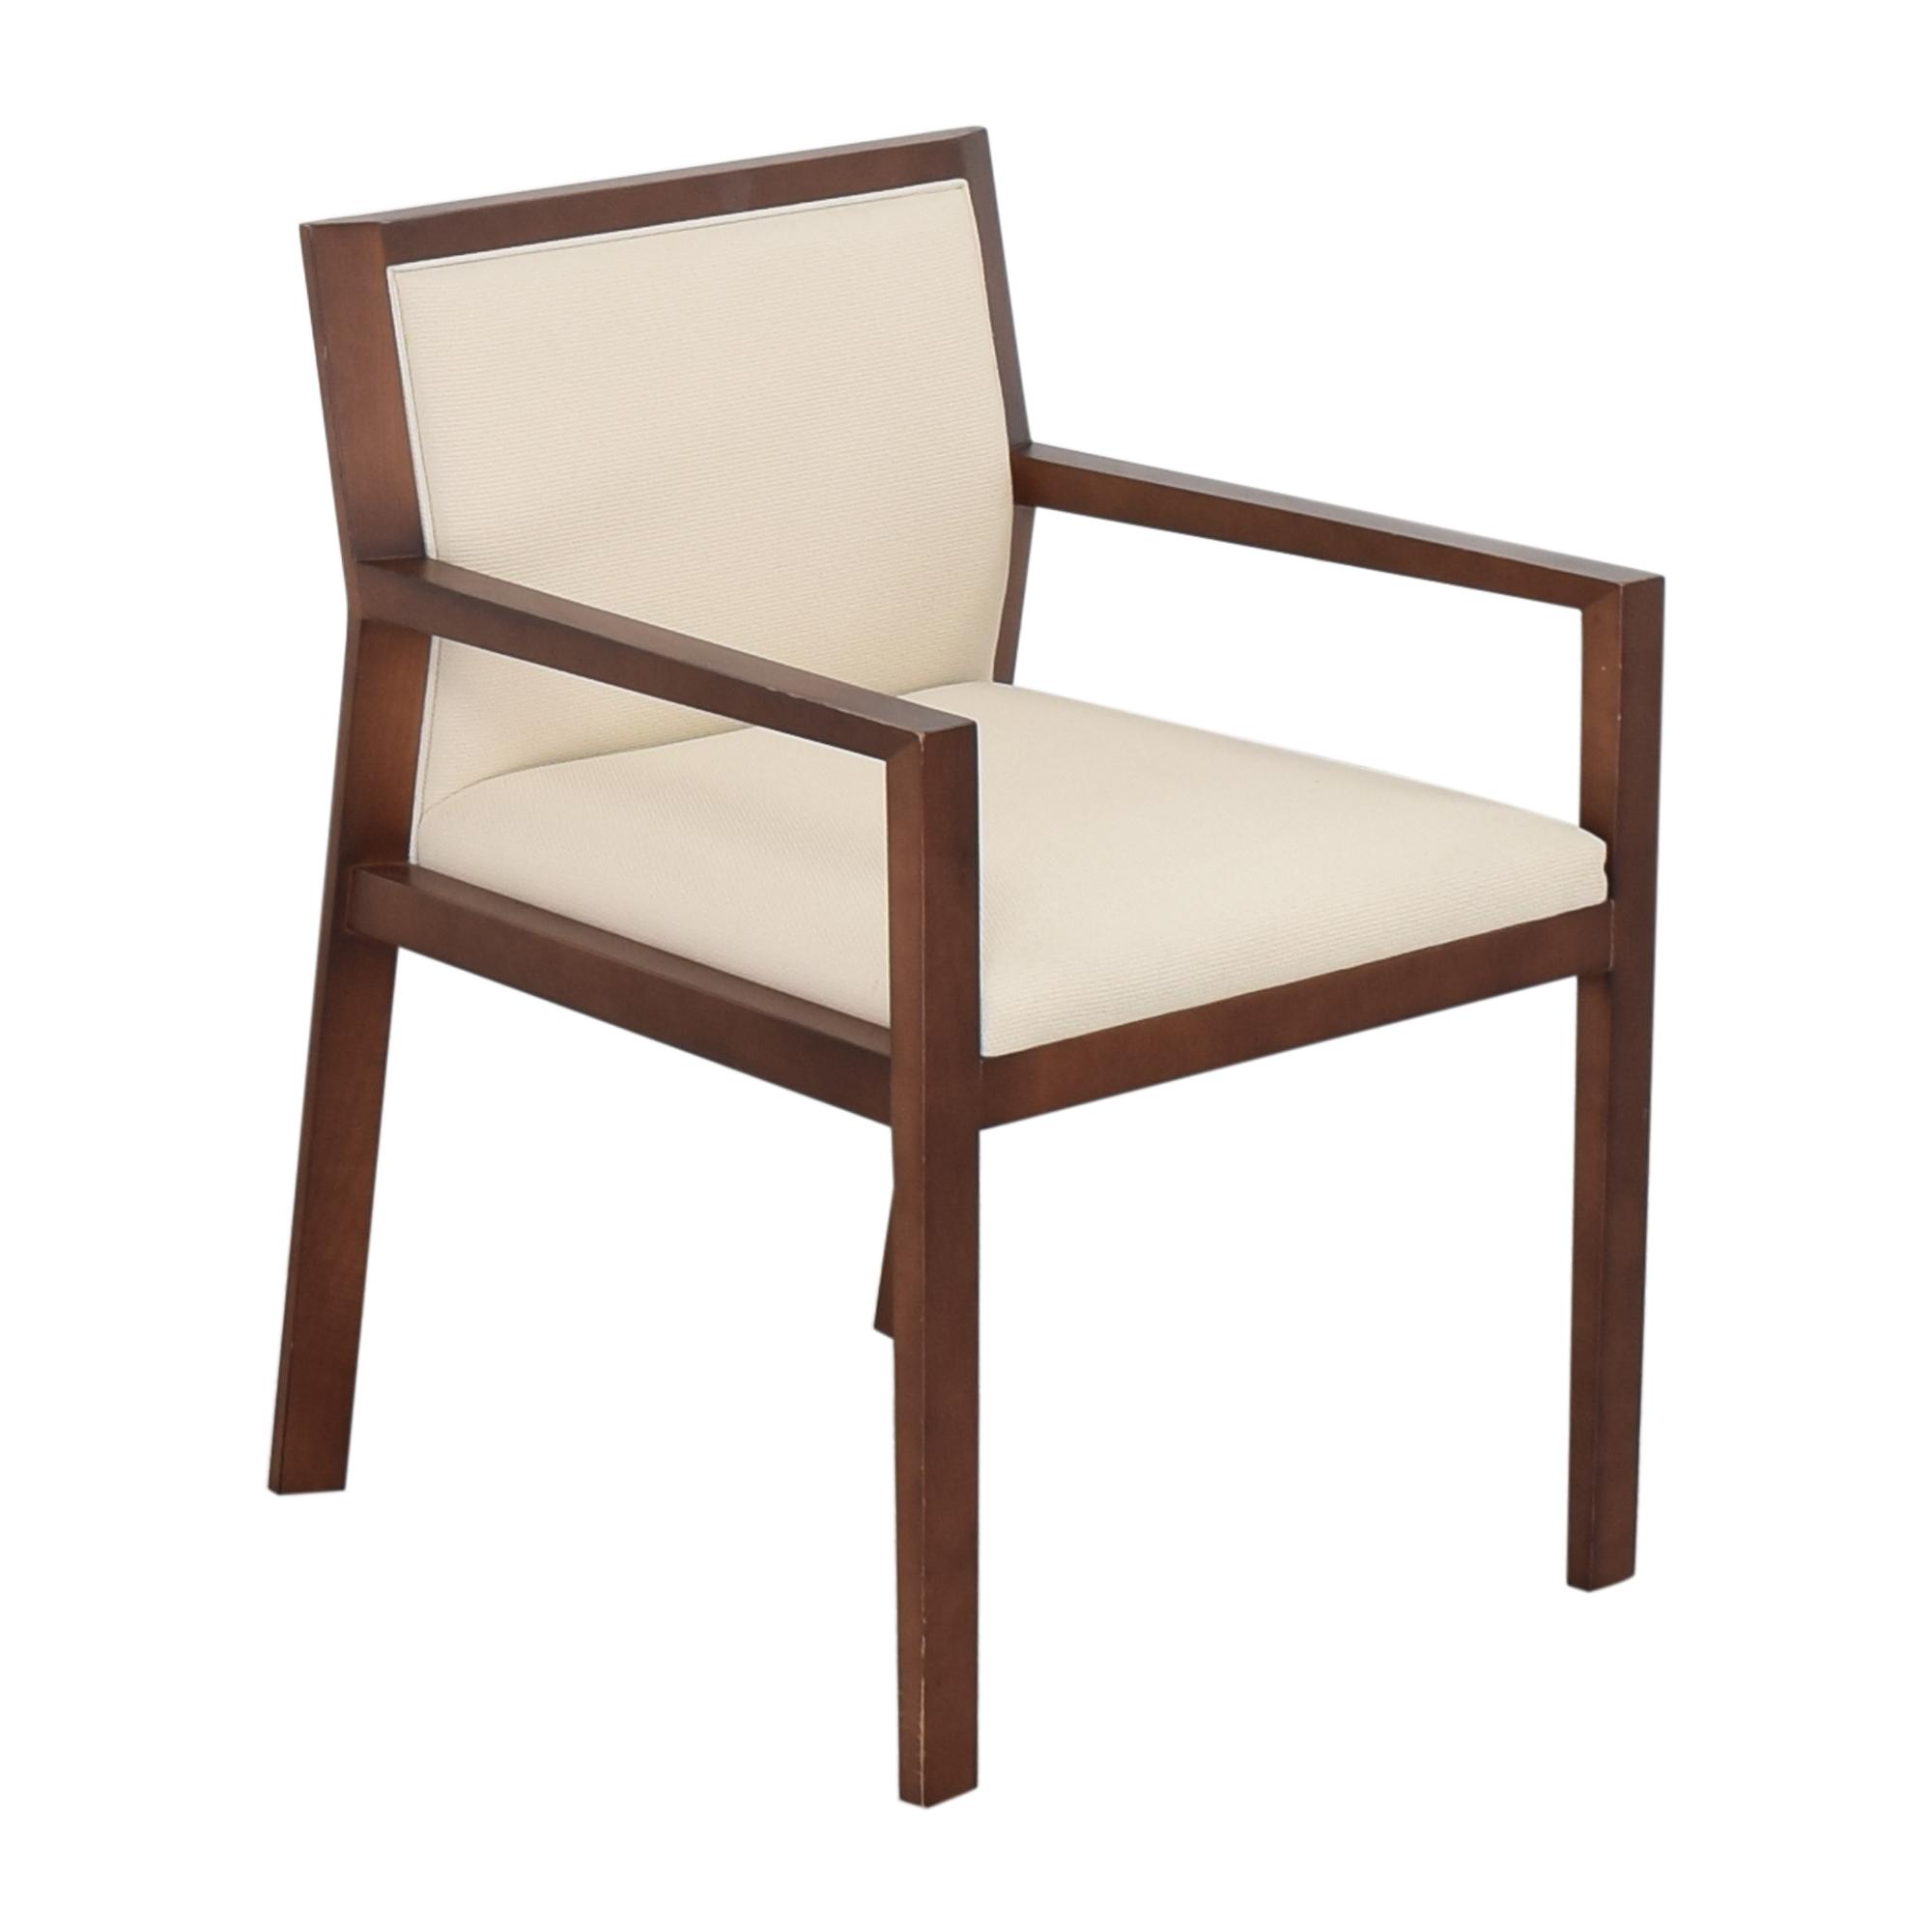 Bernhardt Bernhardt Fabric Desk Chair Accent Chairs